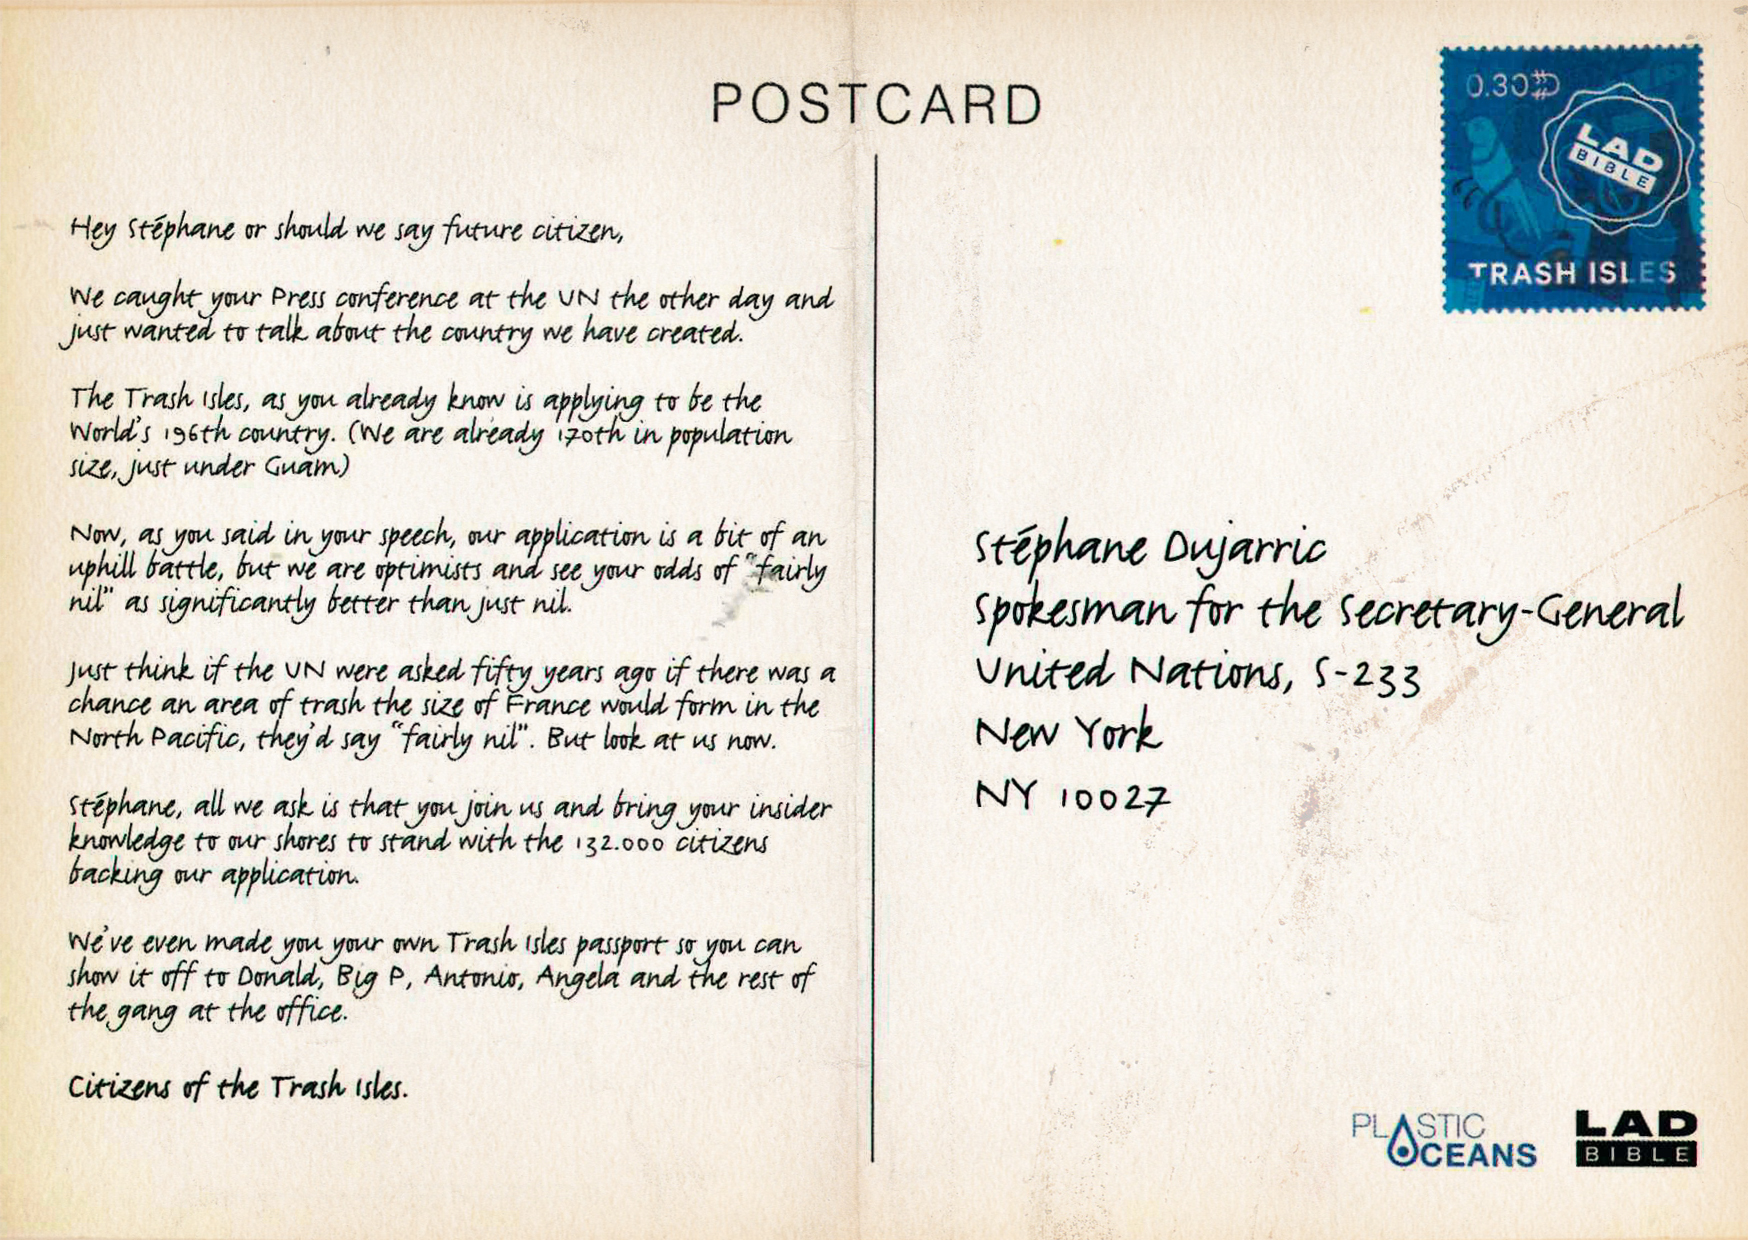 Trash Isles Postcard